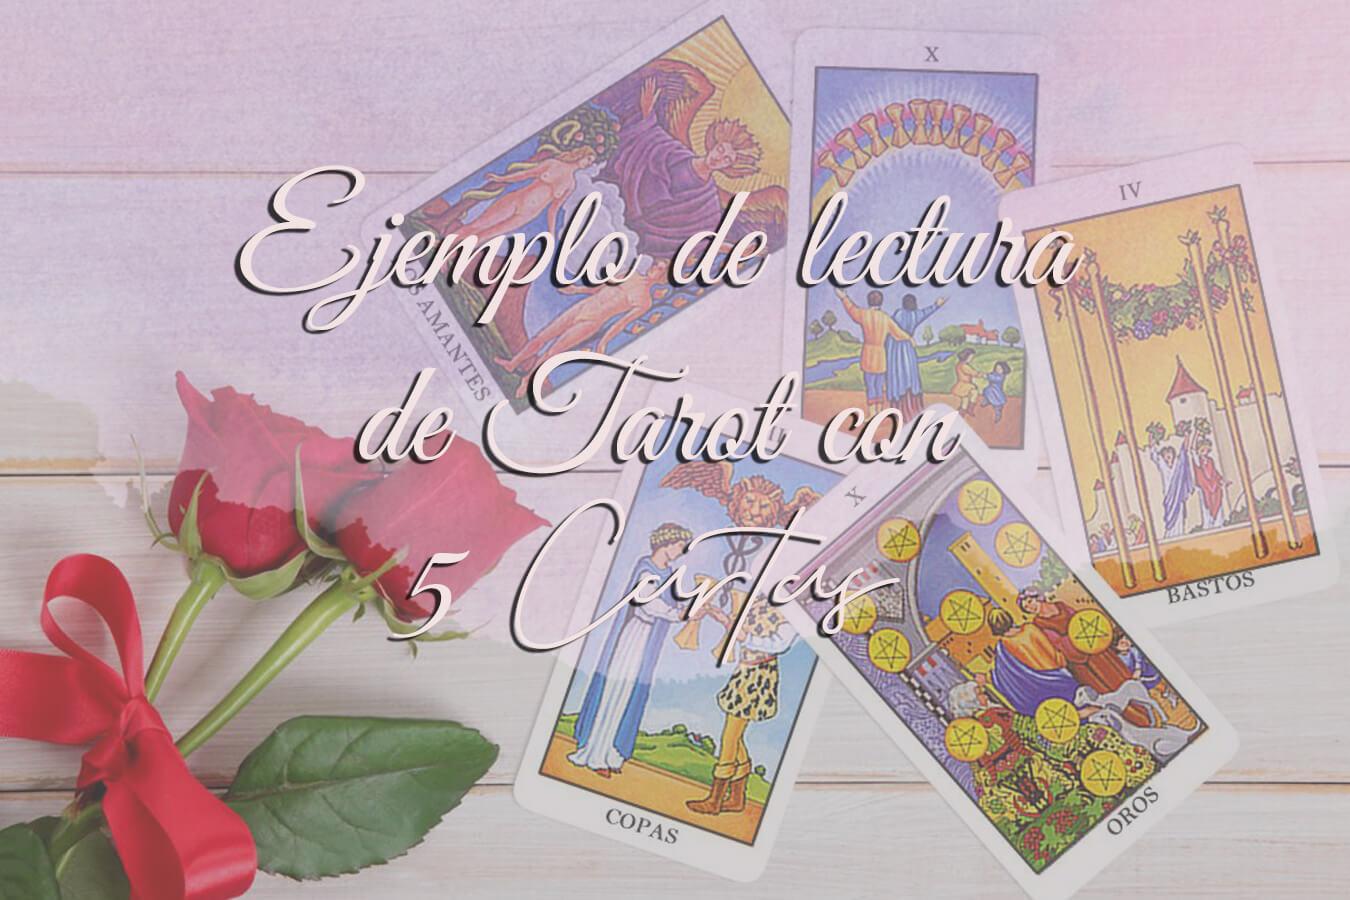 Ejemplo de lectura de Tarot con 5 cartas